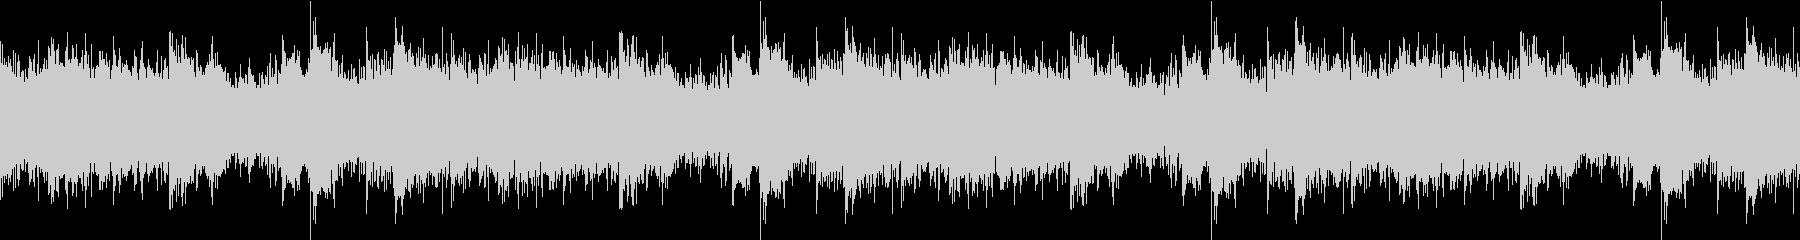 House コードシンセ 6 音楽制作用の未再生の波形